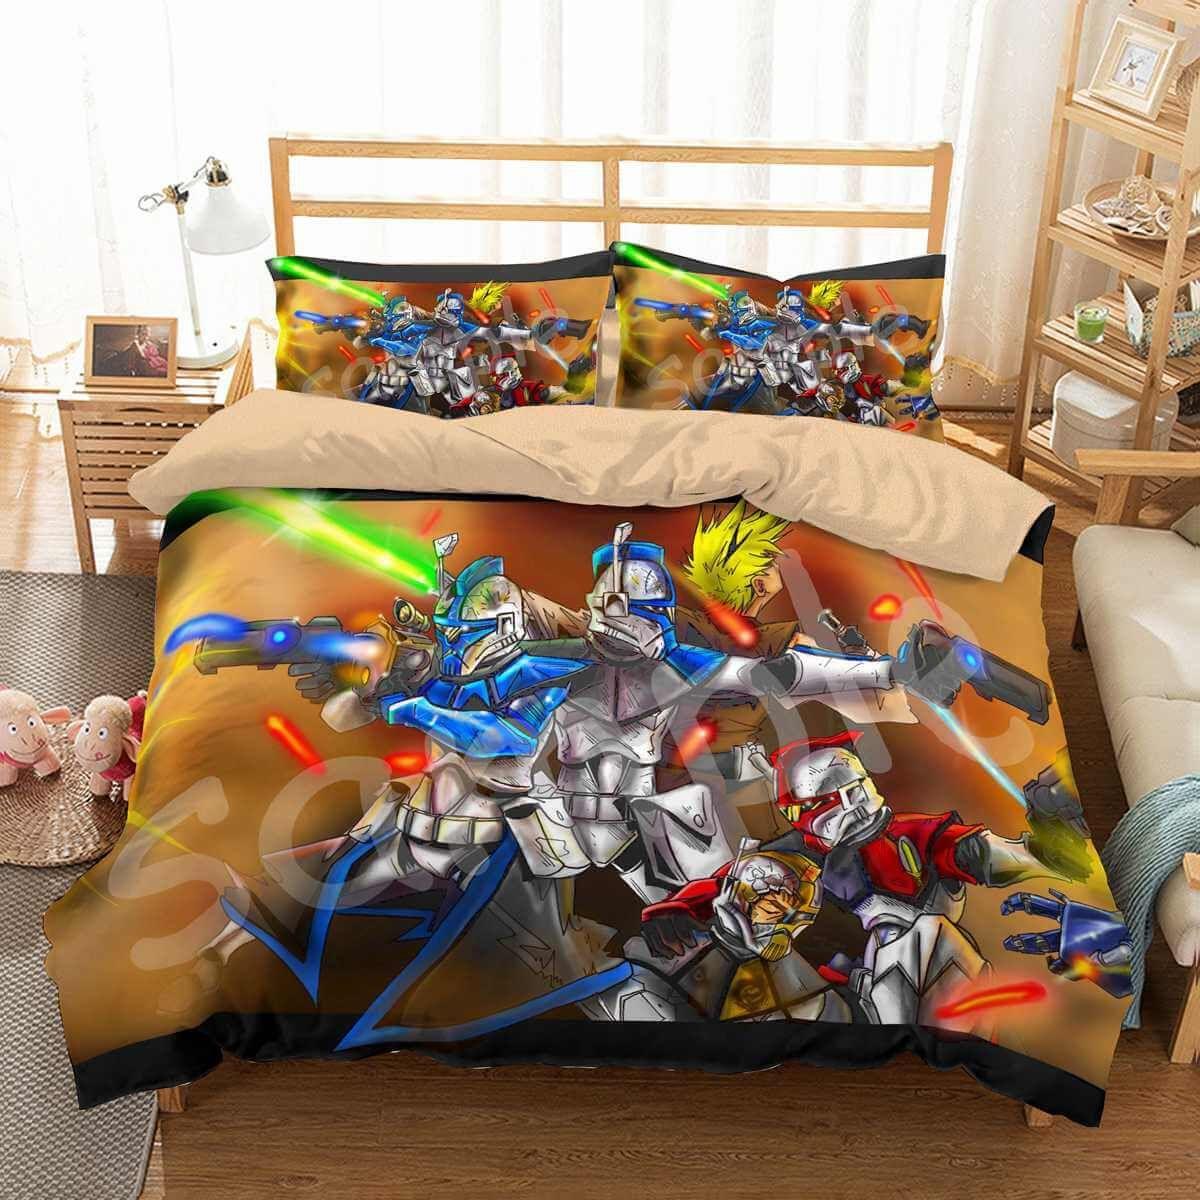 3d Customize Star Wars The Clone Wars Bedding Set Duvet Cover Set